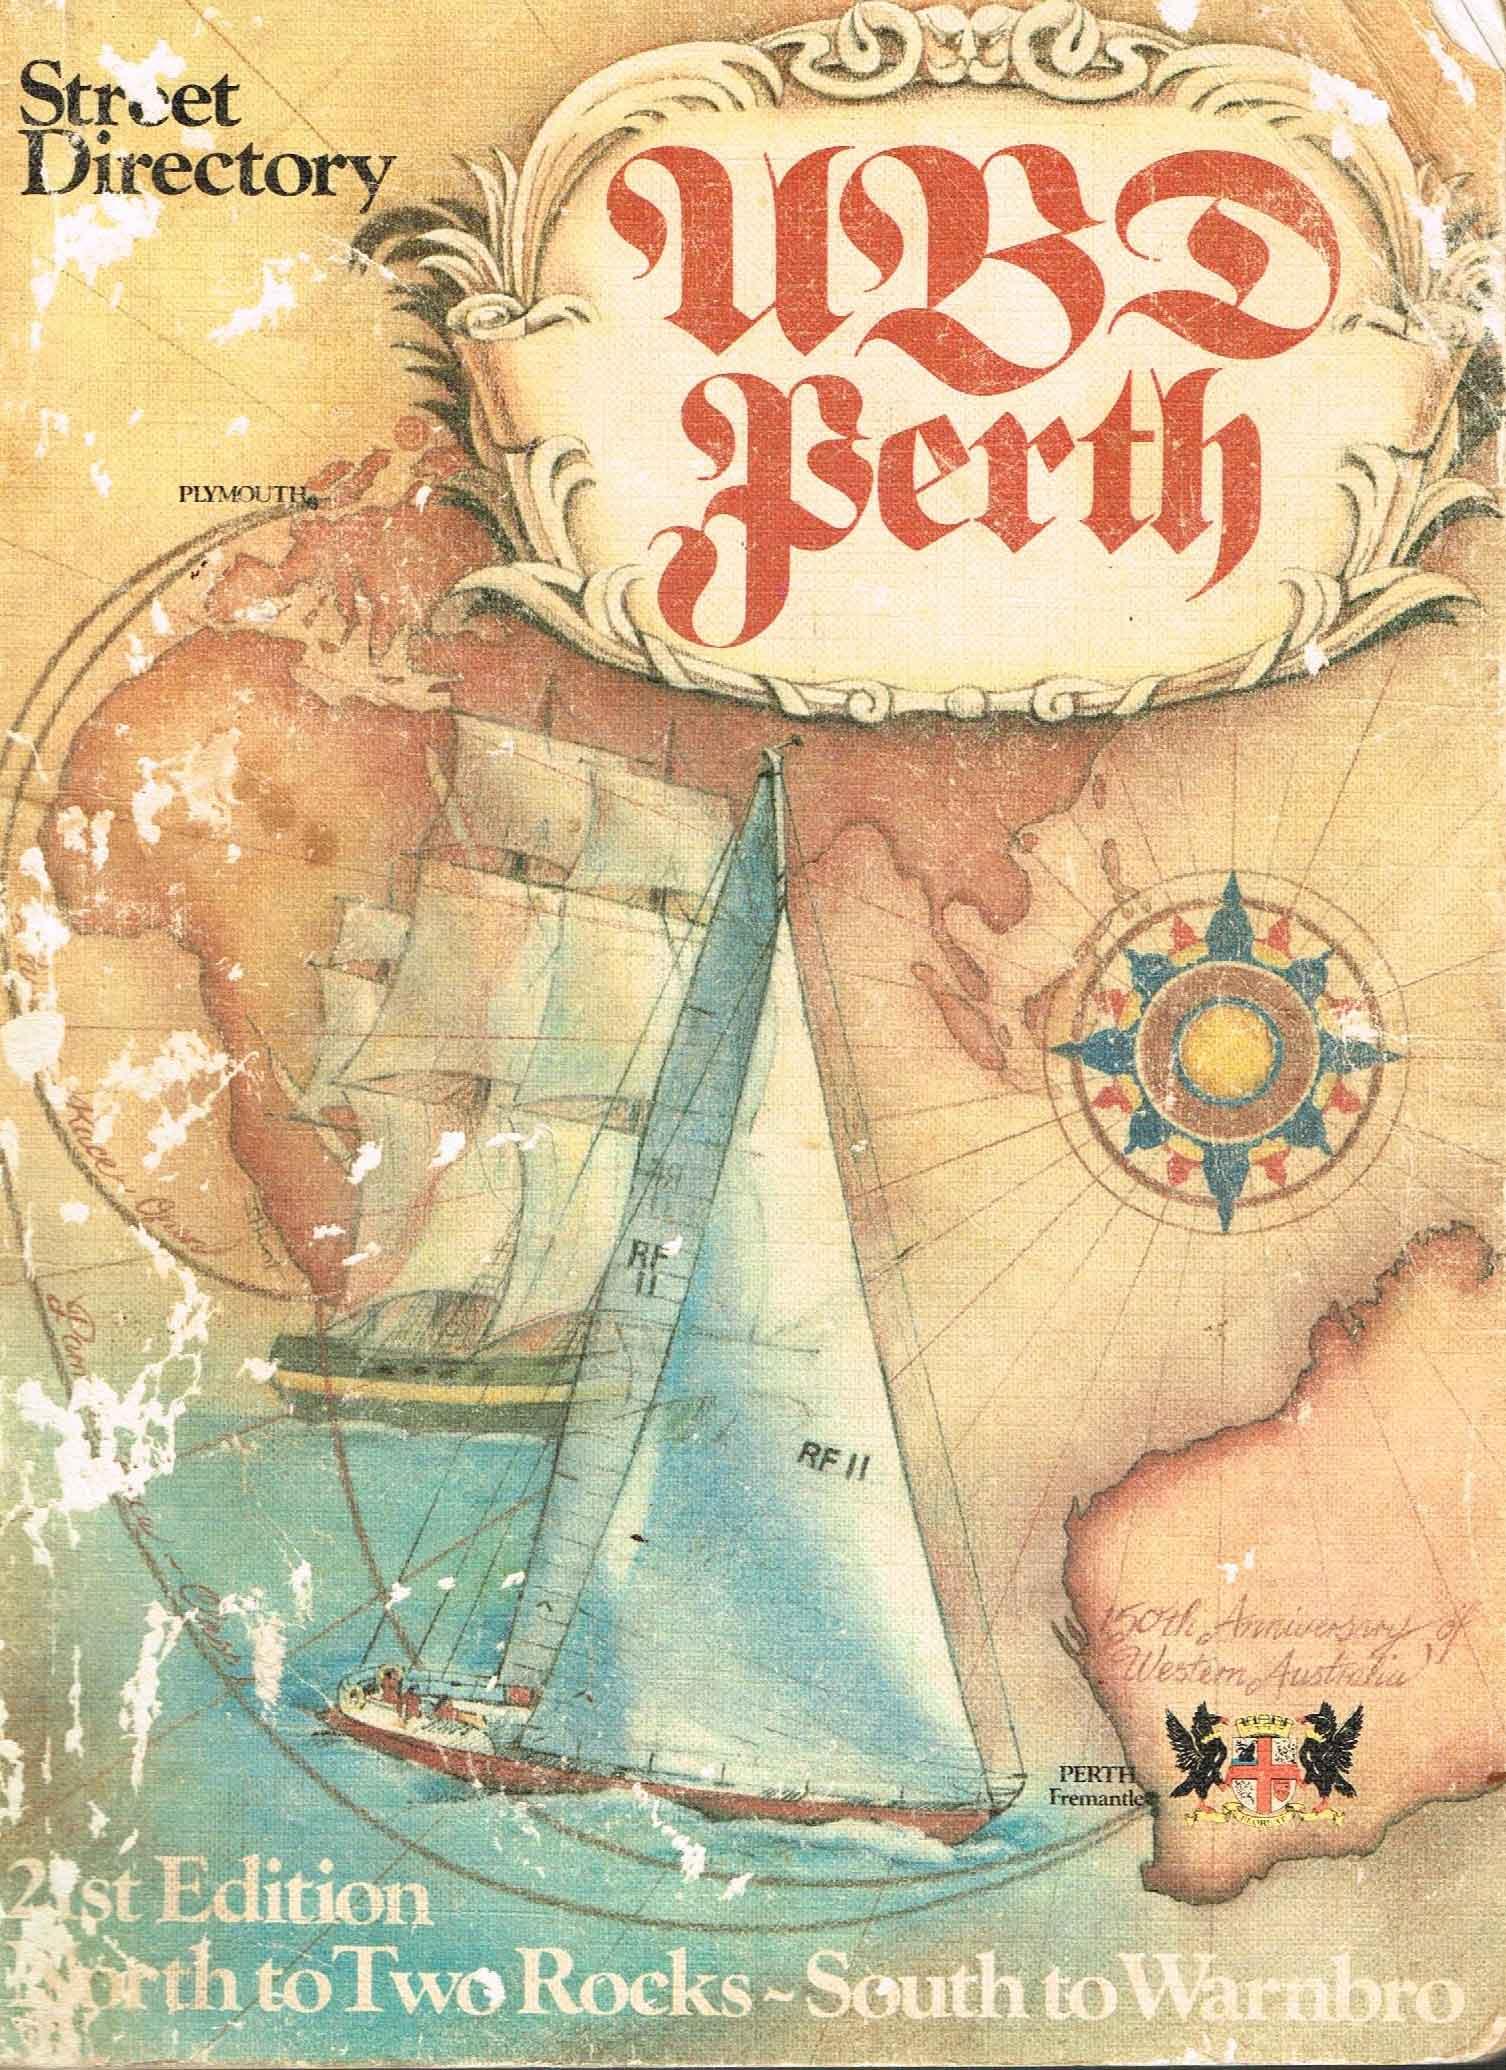 UBD-Perth-21st-Edition